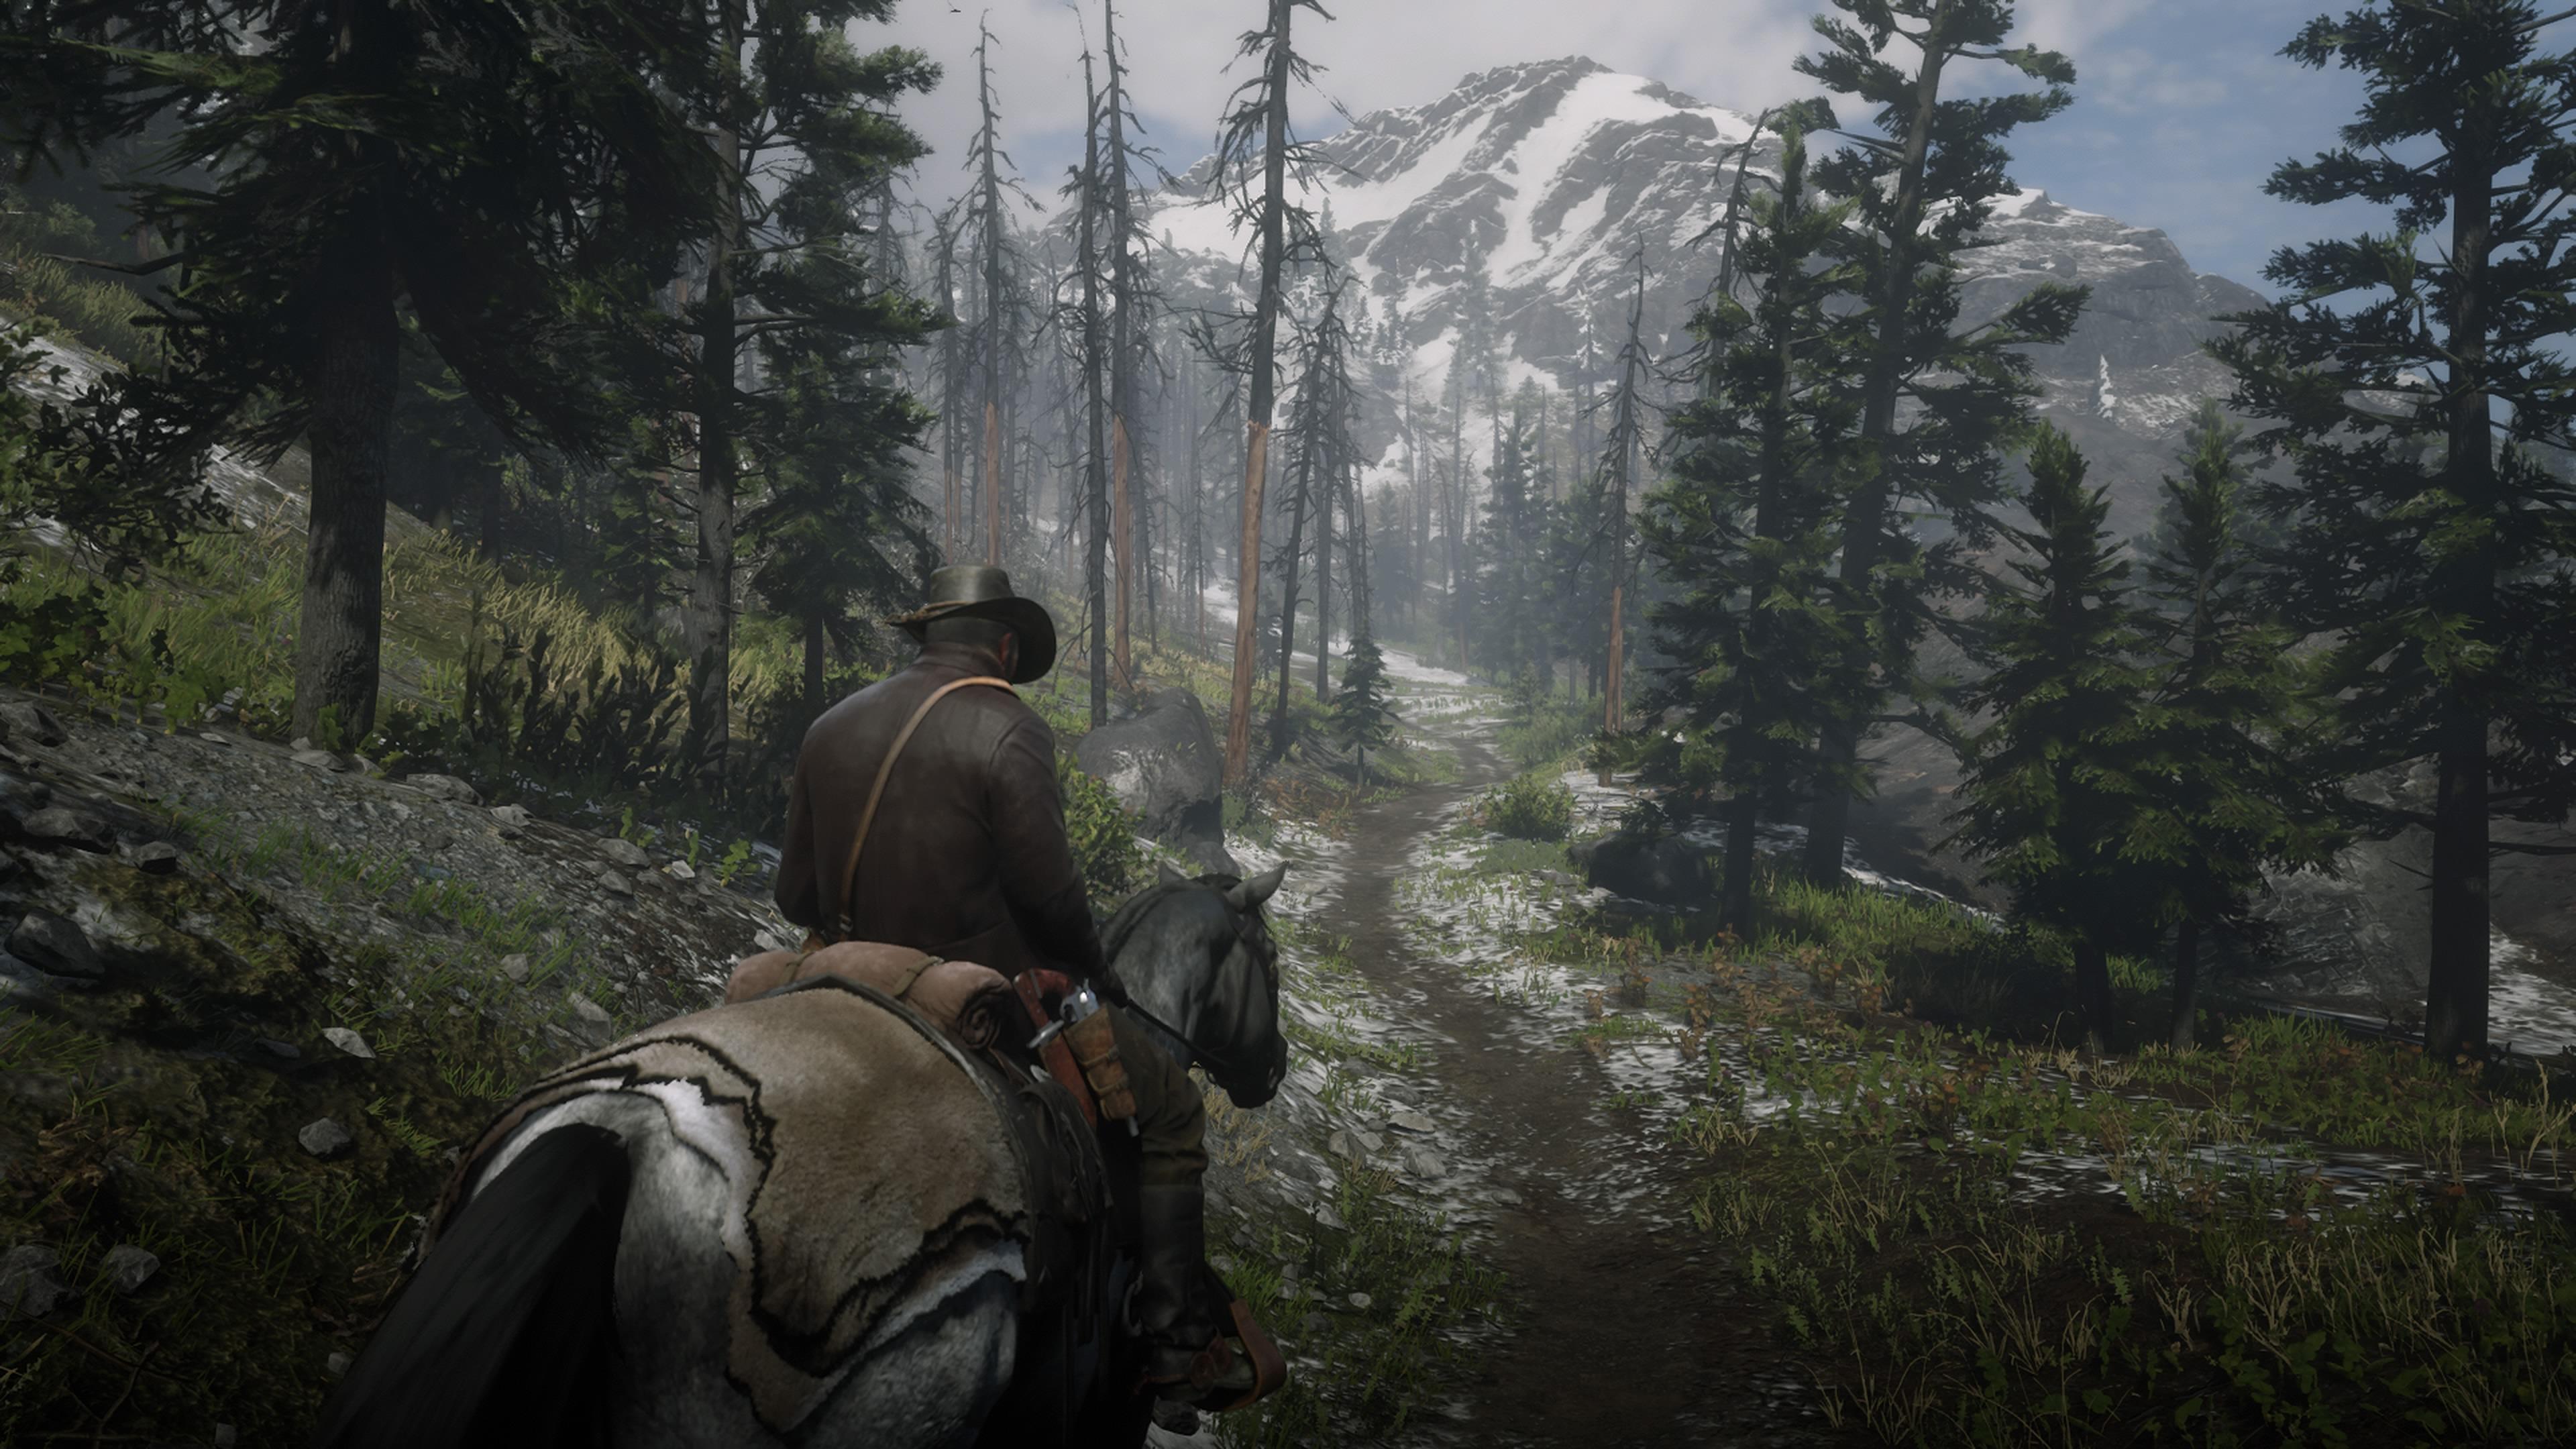 Red Dead Redemption 2_20181028120555.jpg - Red Dead Redemption 2